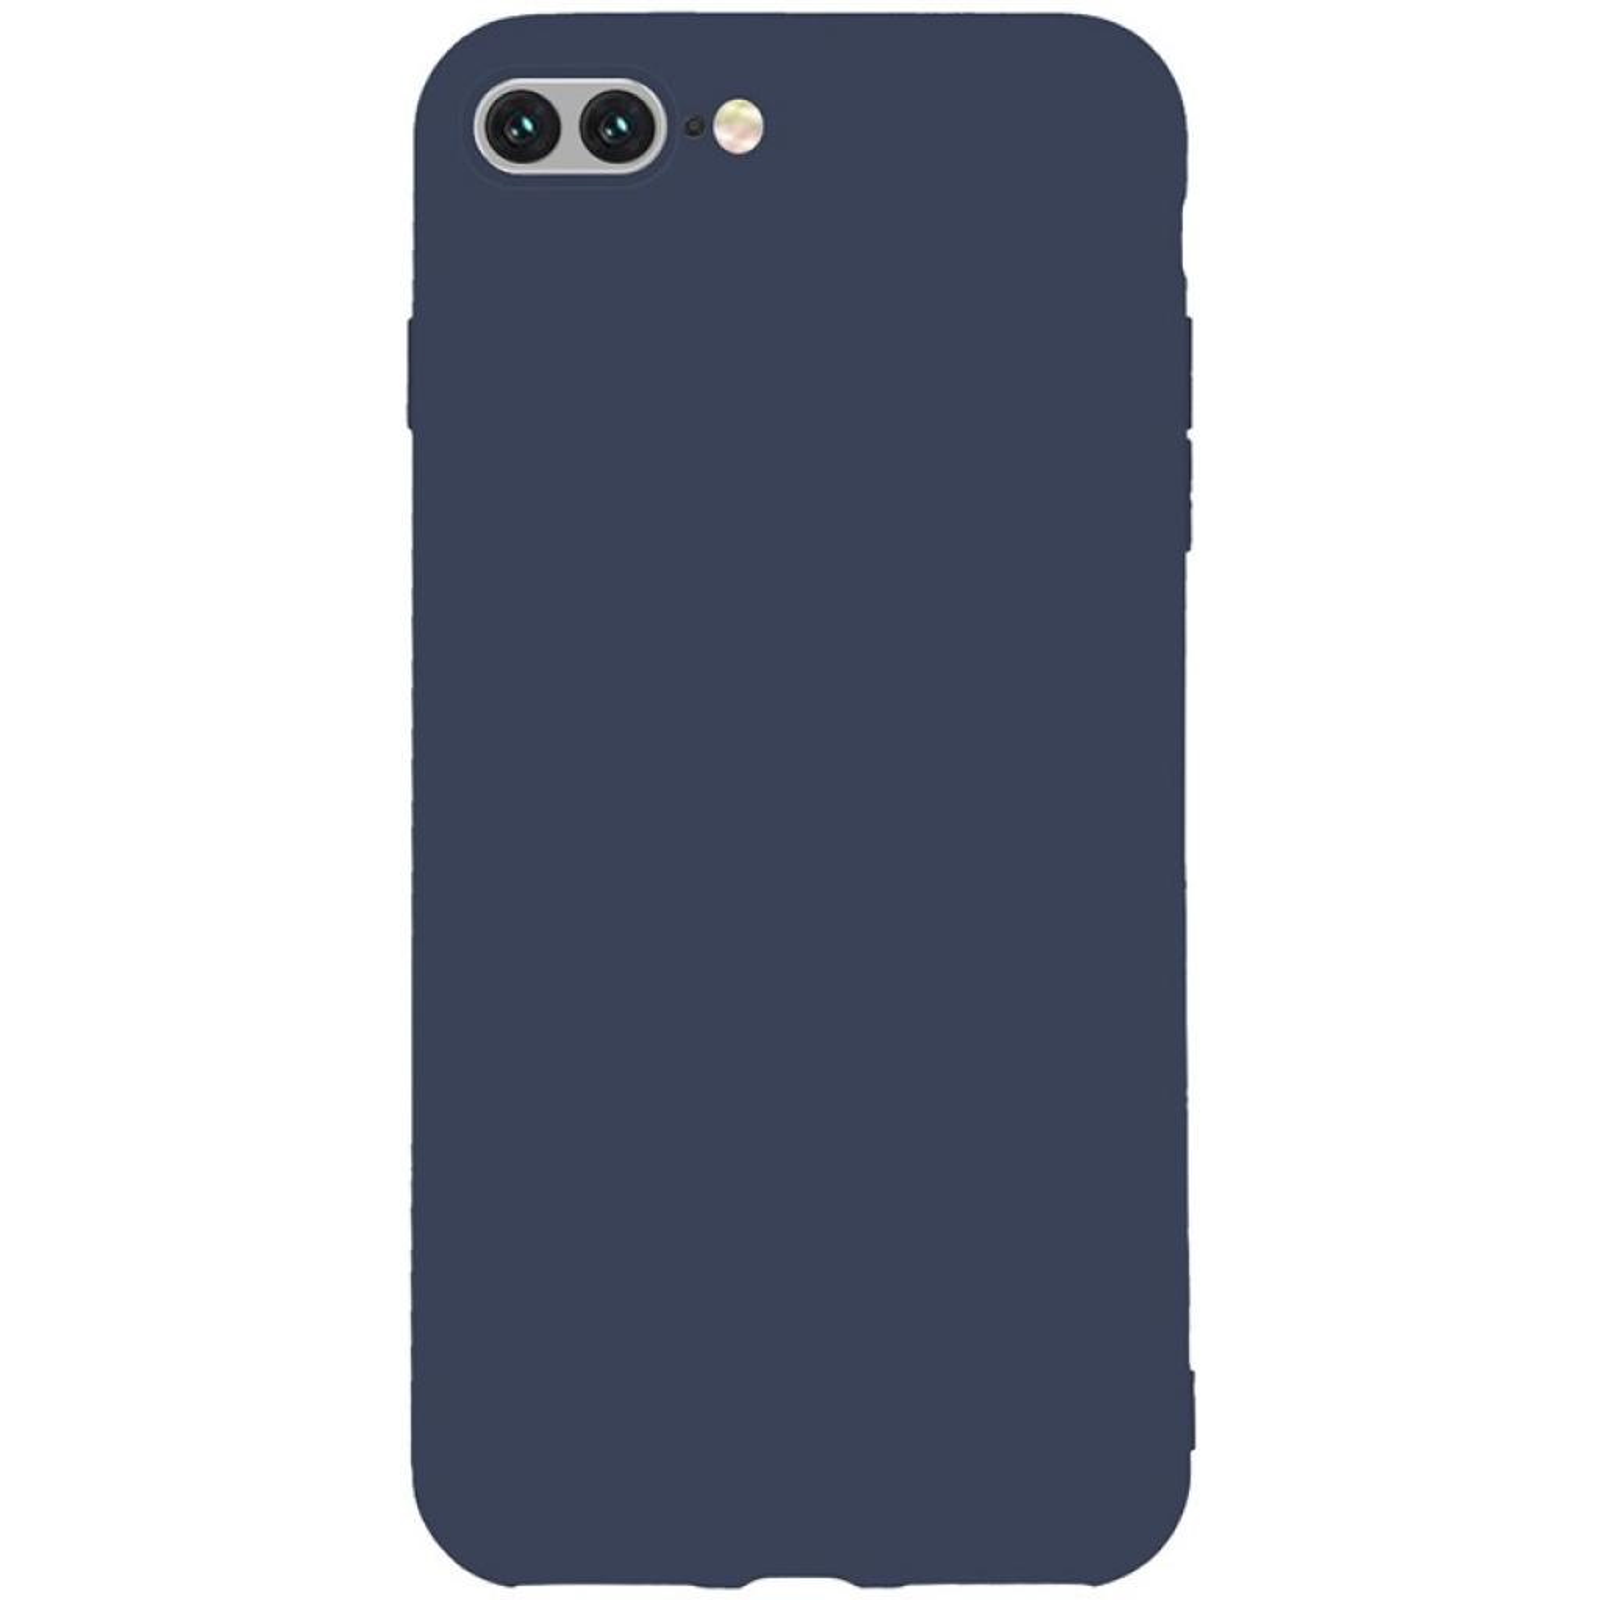 Чехол для моб. телефона Toto 1mm Matt TPU Case Apple iPhone 7 Plus/8 Plus Navy Blue (F_101215)